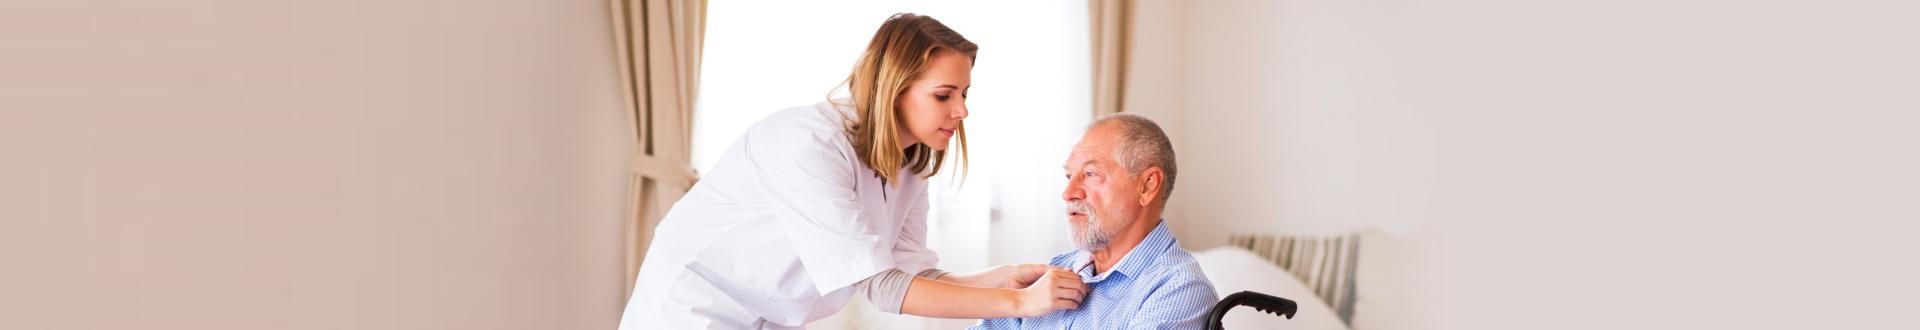 caregiver fixing senior man's clothes